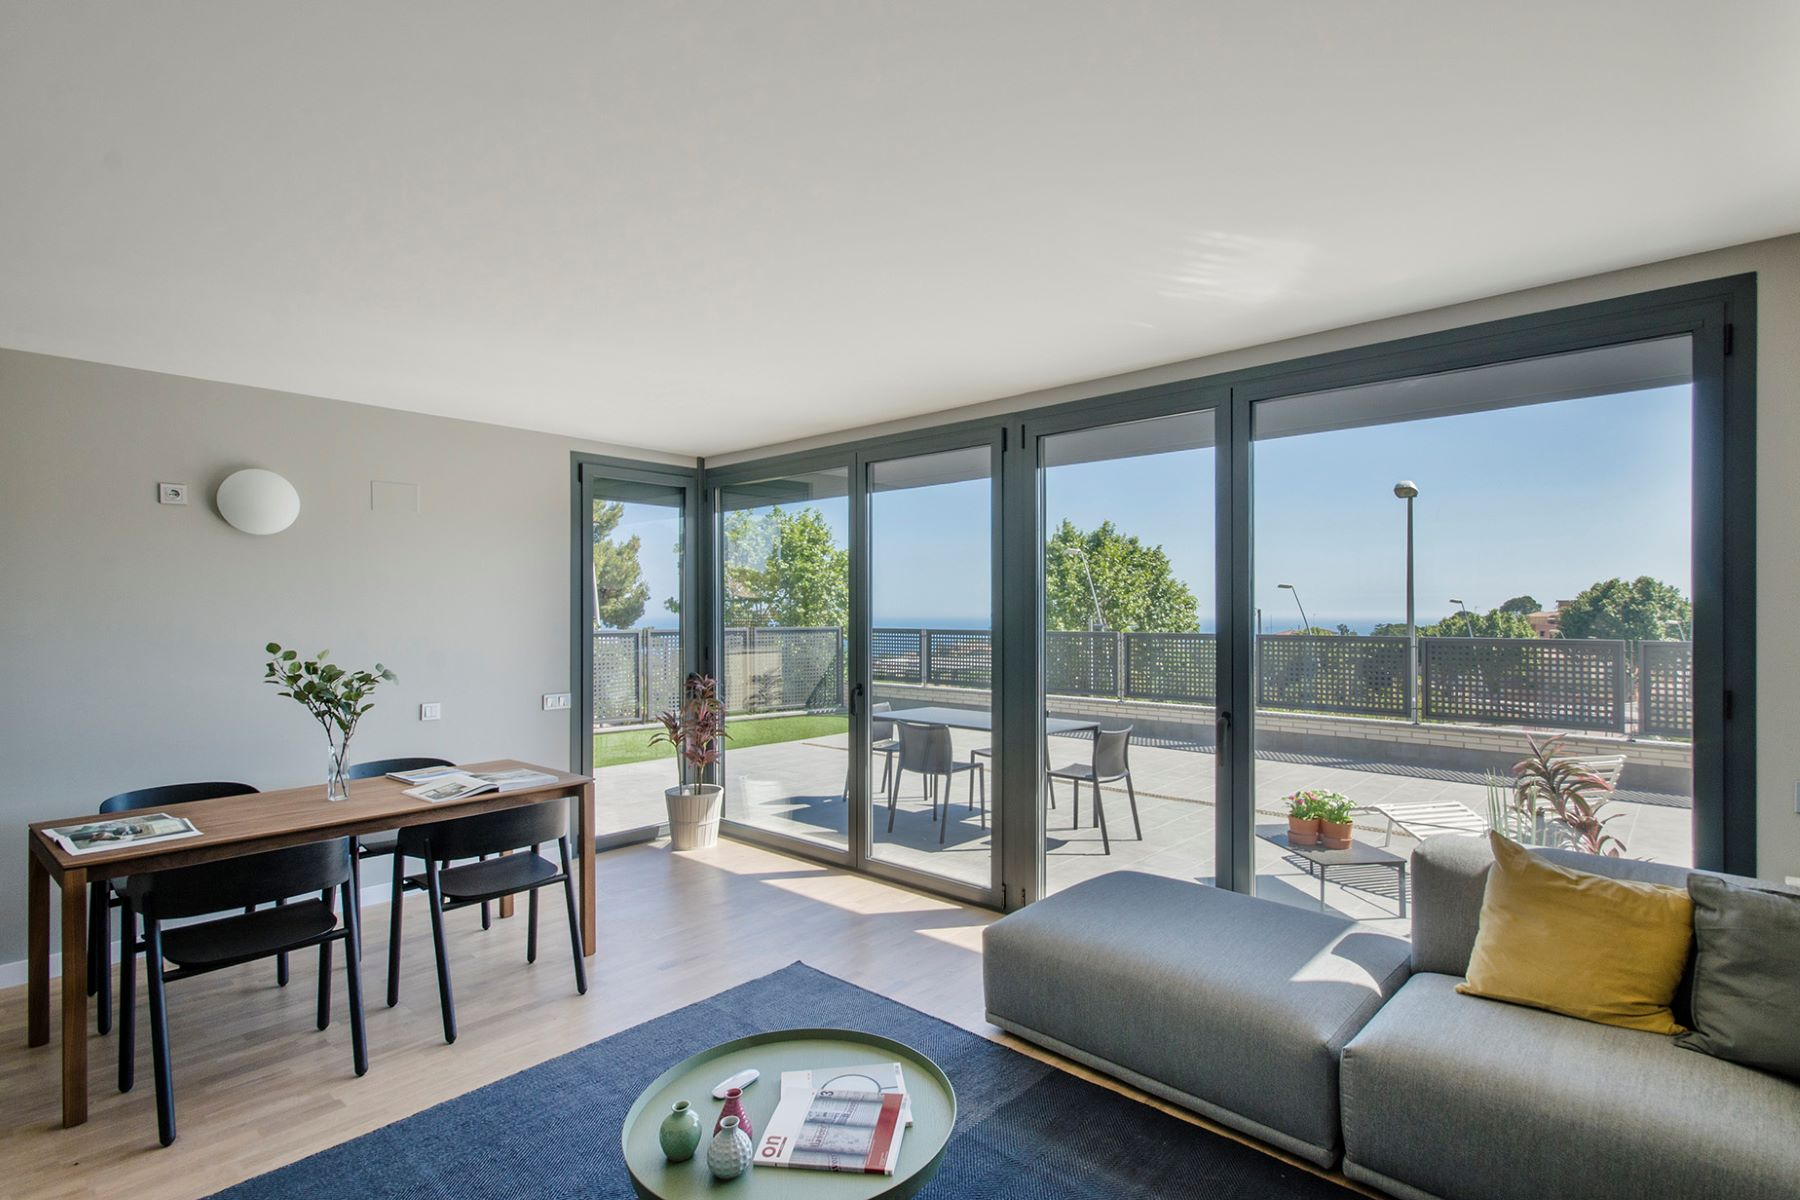 独户住宅 为 销售 在 New promotional offer in Teià with sea view Teia, 巴塞罗那, 08329 西班牙